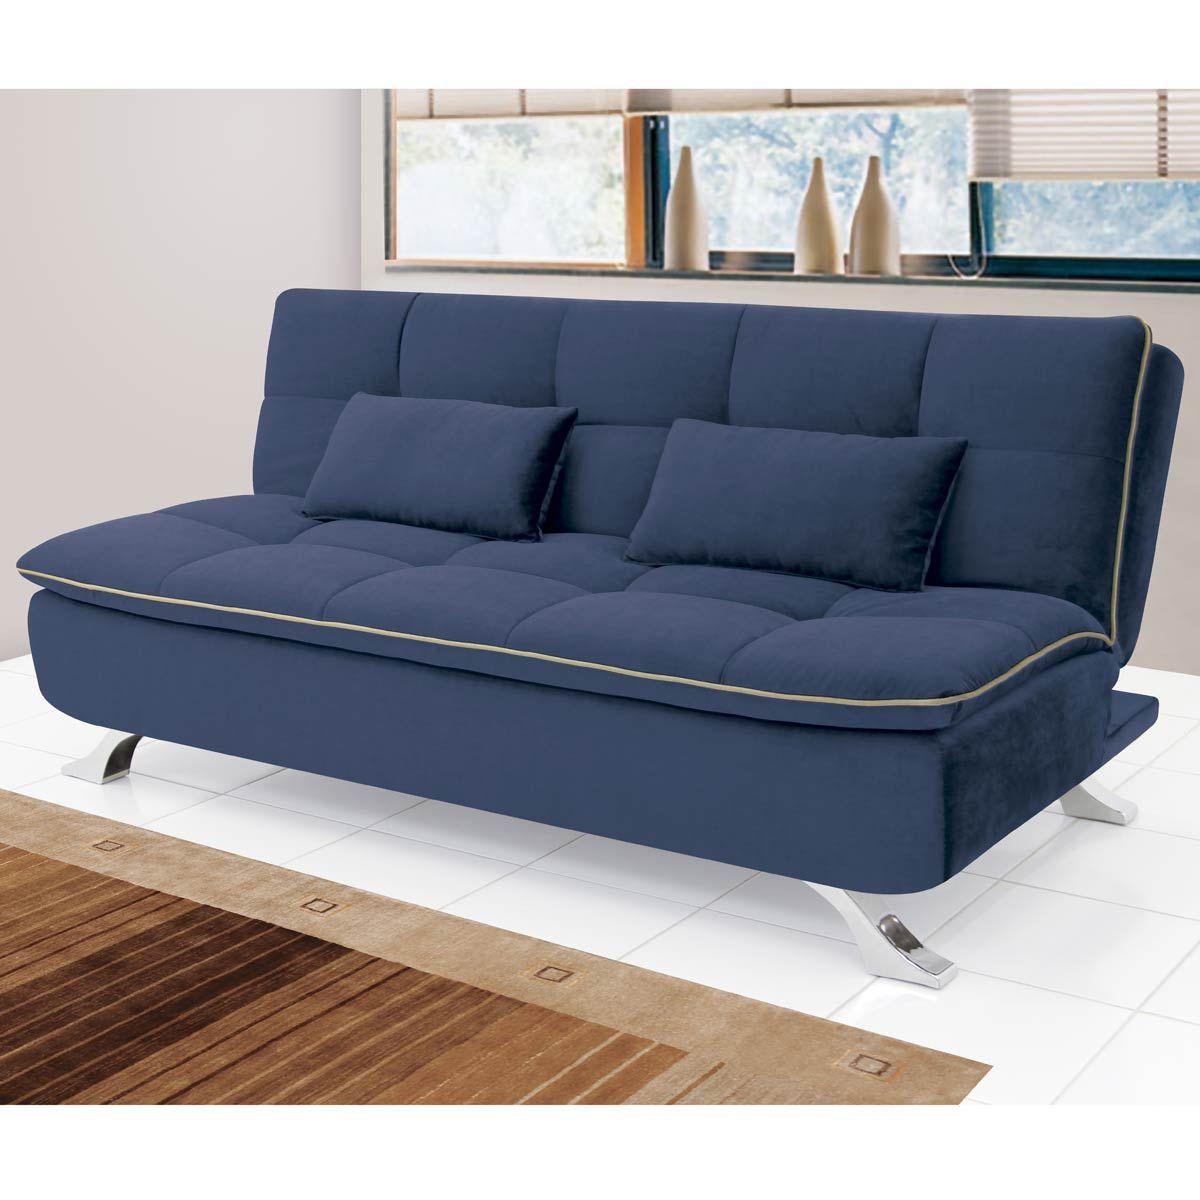 sof cama mayara 3 lugares 1 90 m suede azul linoforte loft ideas and lofts. Black Bedroom Furniture Sets. Home Design Ideas